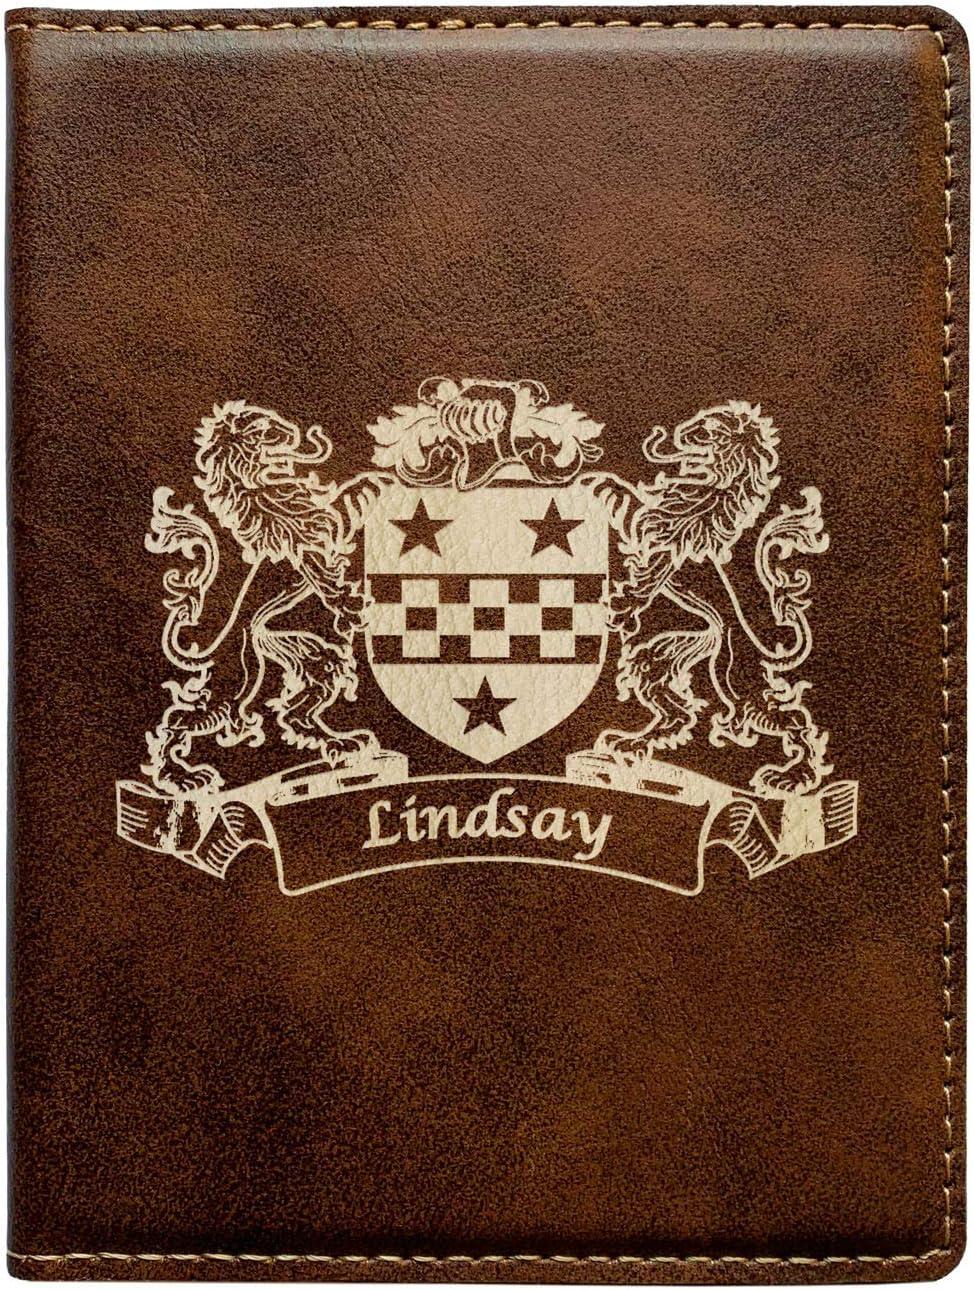 Lindsay Irish Coat of Arms Leather Passport Wallet